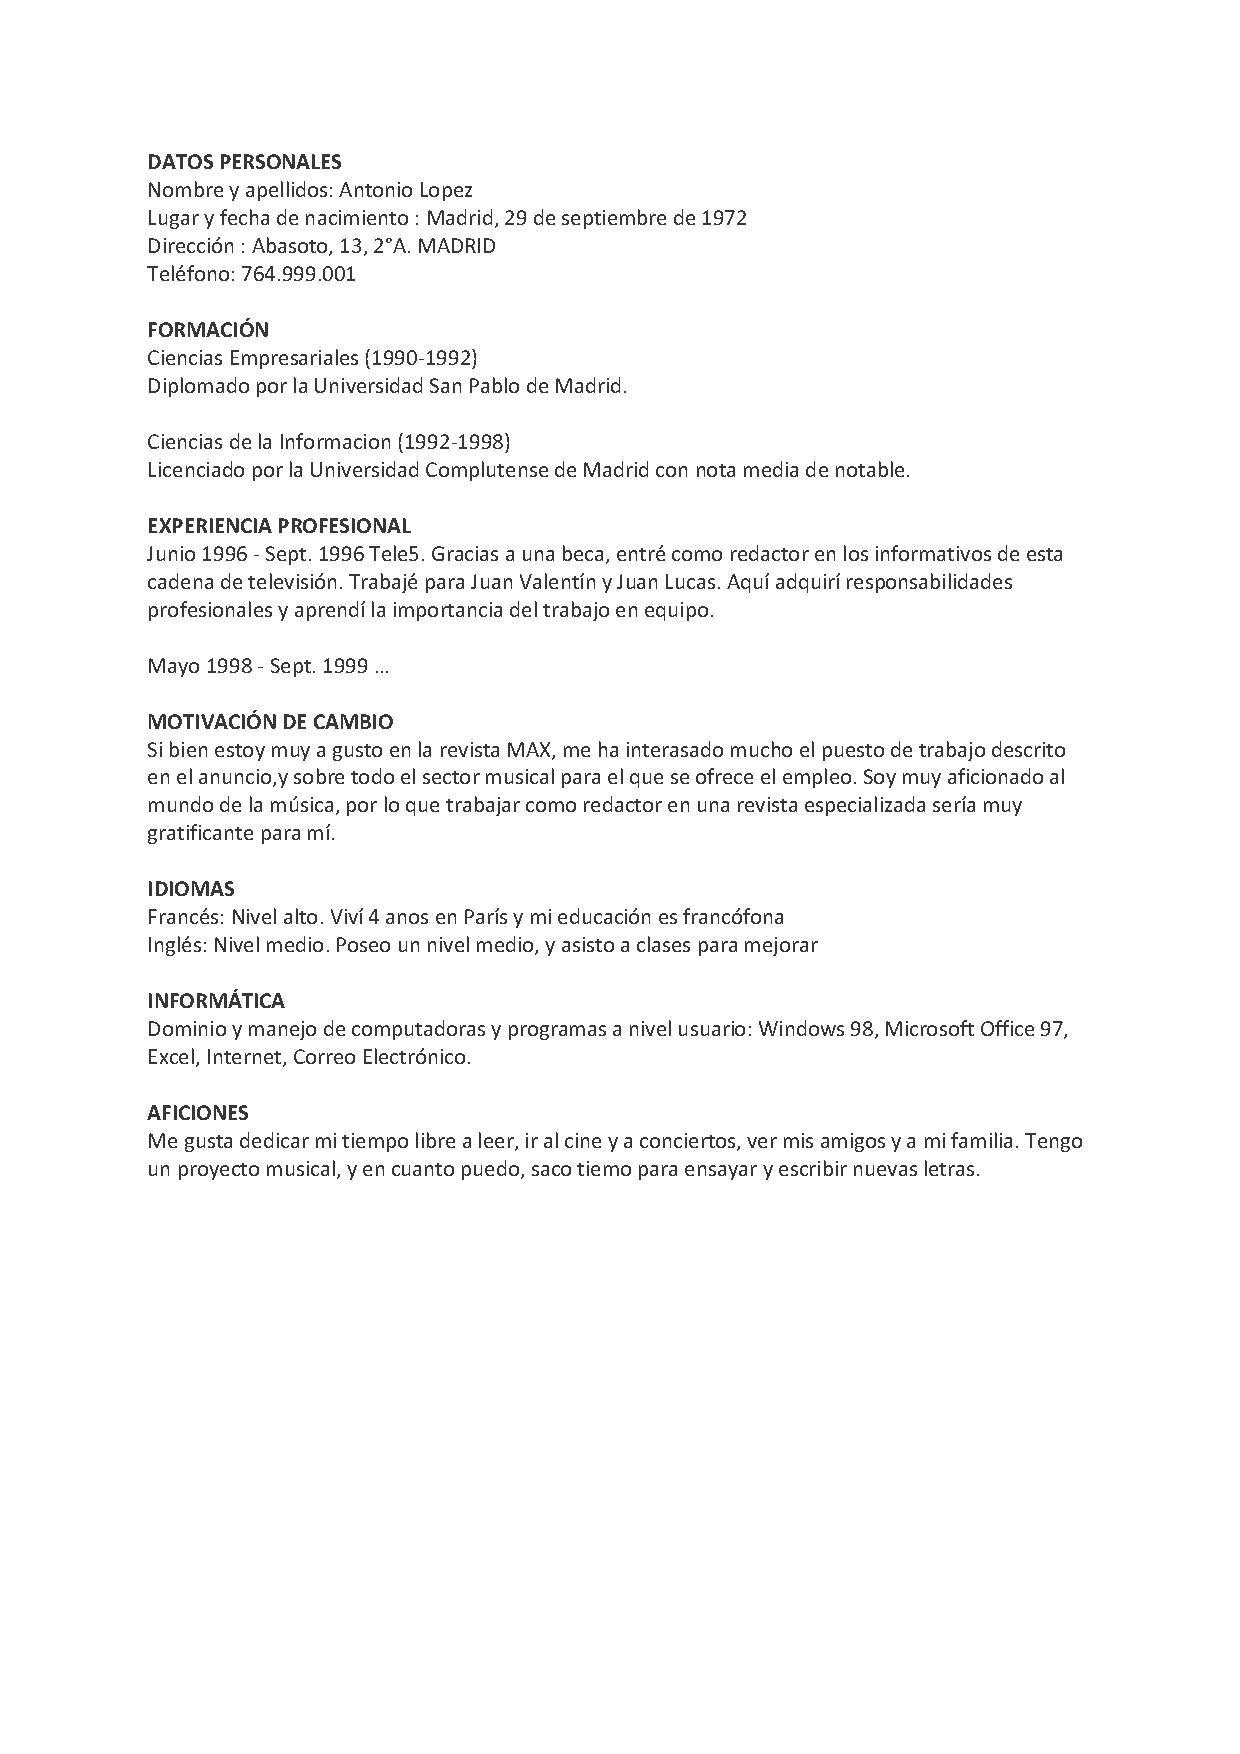 Currículum Vitae –Spanischer Lebenslauf